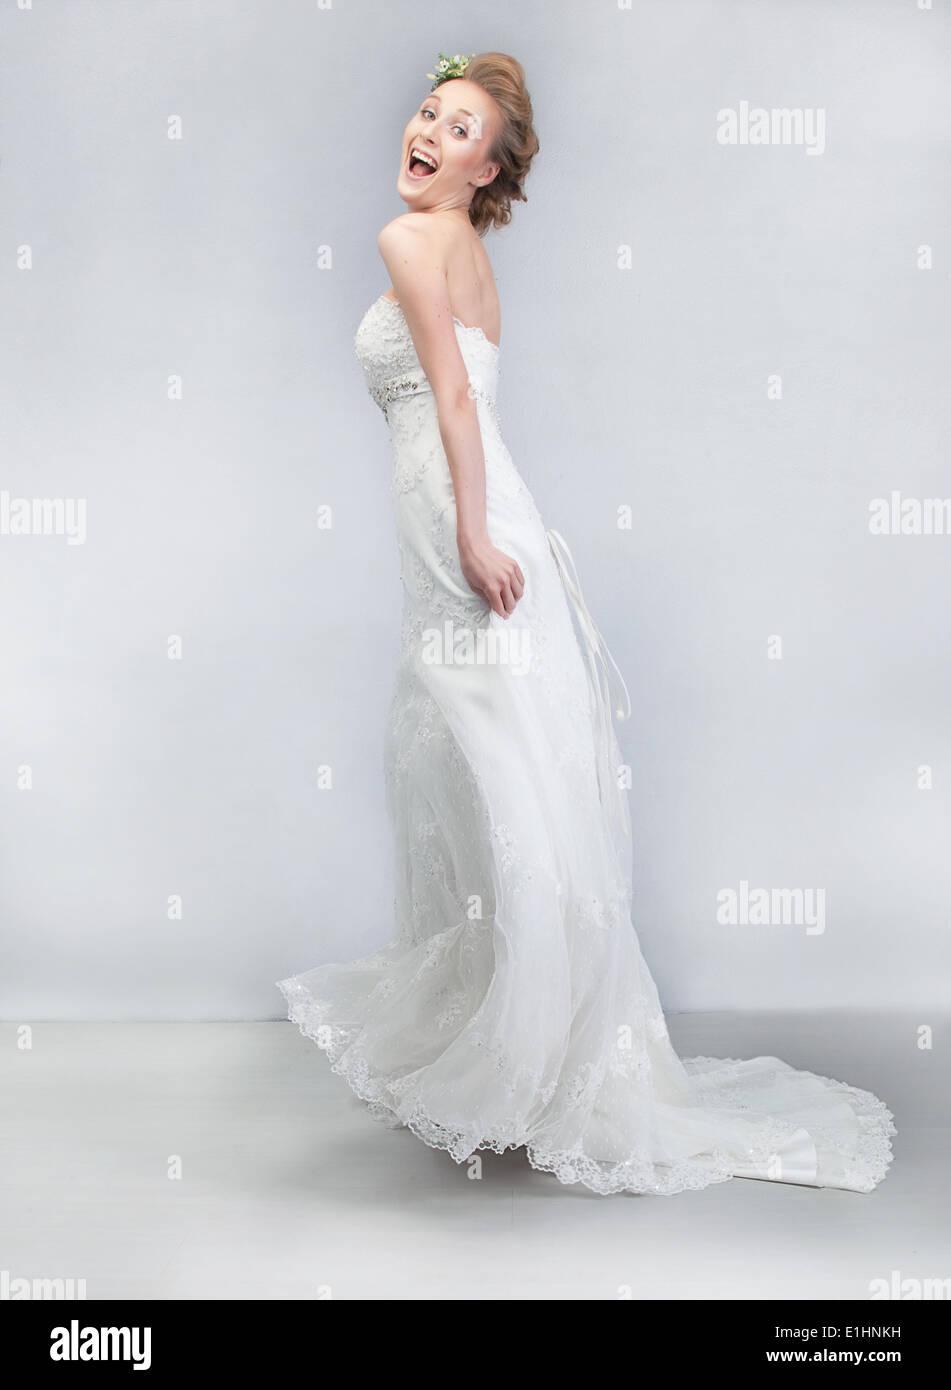 Wedding Photo Funny Stockfotos & Wedding Photo Funny Bilder - Alamy